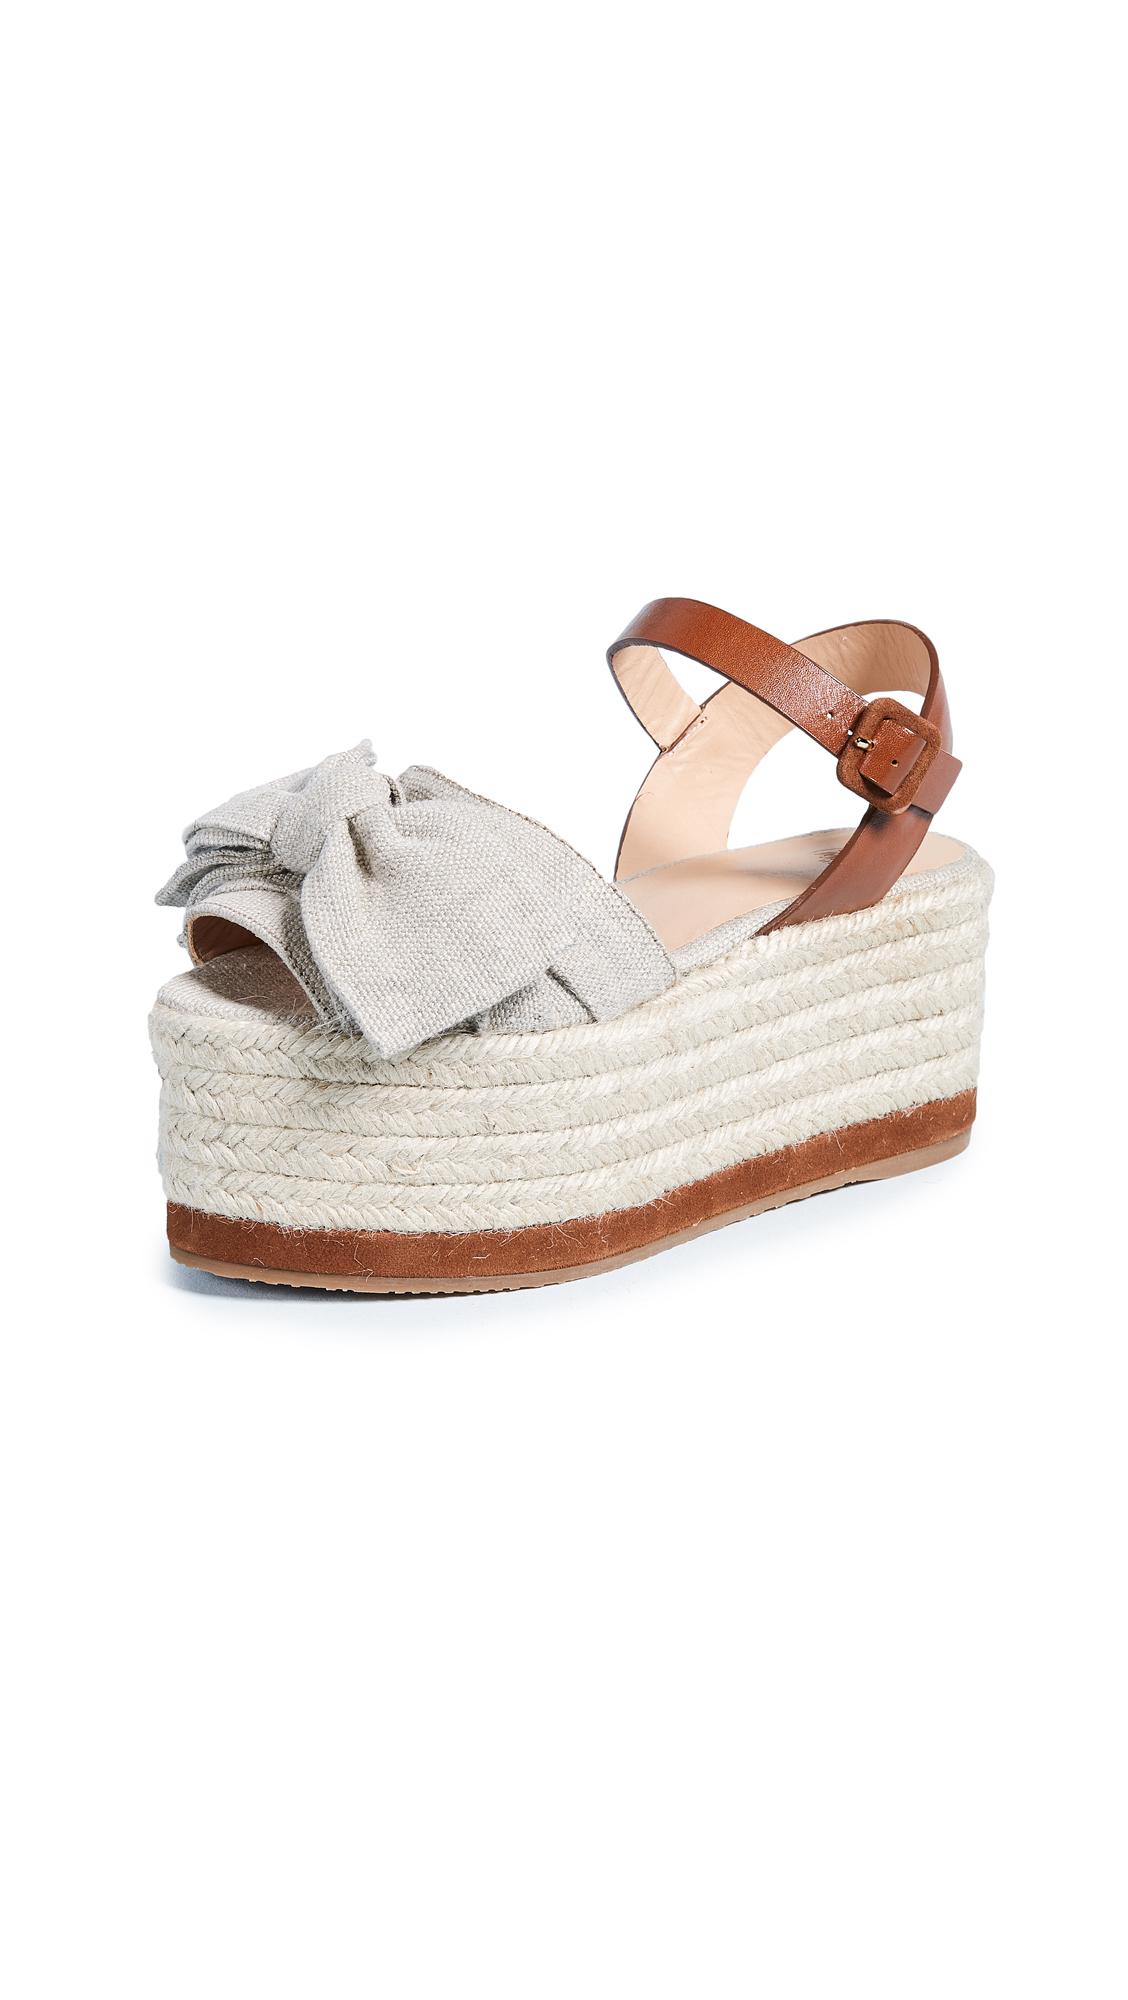 Castaner Wistaria Flatform Sandals - Natural/Natural Yute